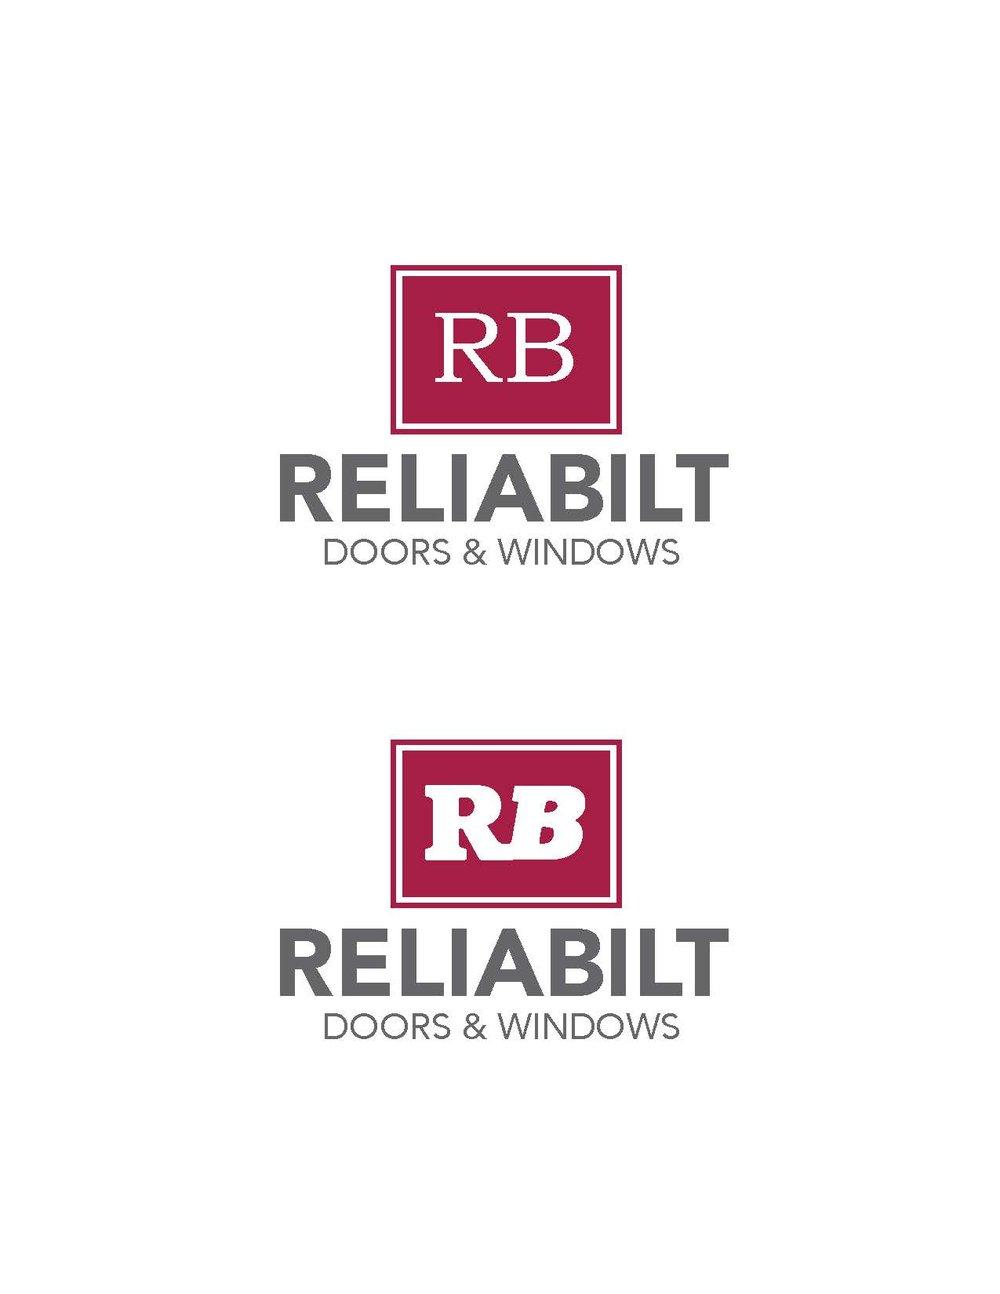 sc 1 st  erin k. monaghan creative & Redesigned logo for RB Doors u0026 Windows u2014 ERIN K. MONAGHAN CREATIVE